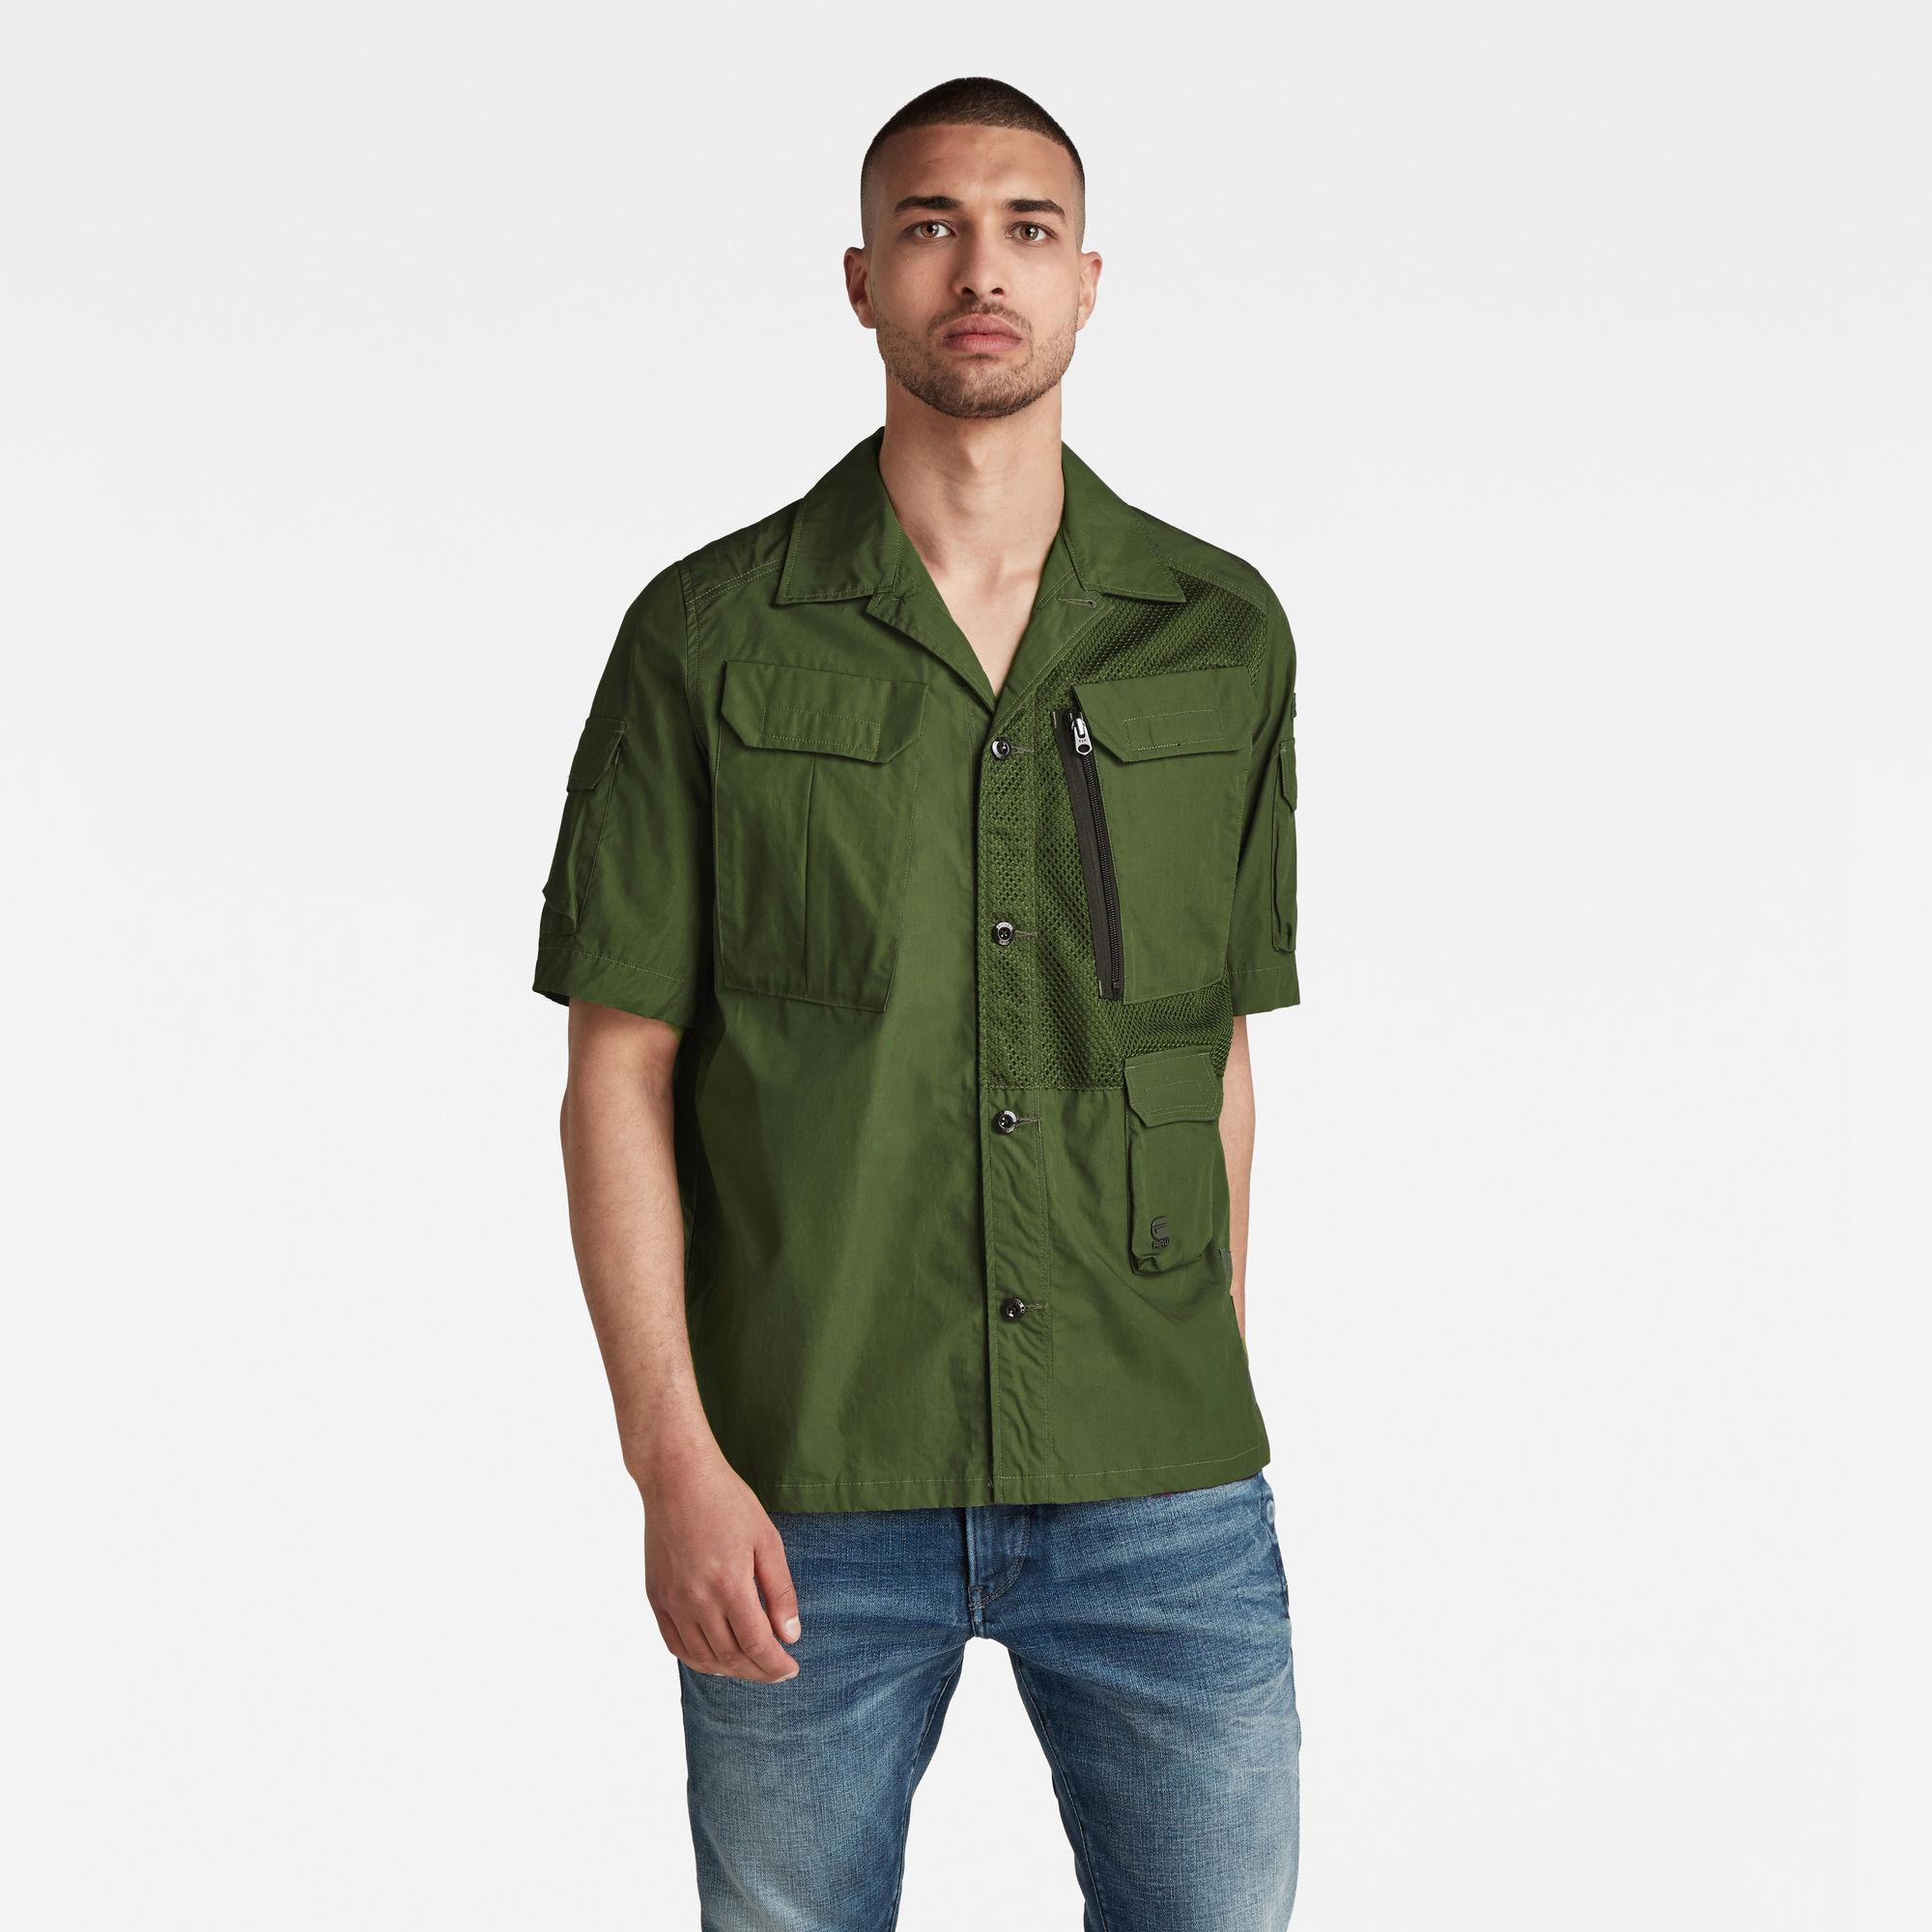 G-Star RAW Heren Utility Poplin Cropped Shirt Groen